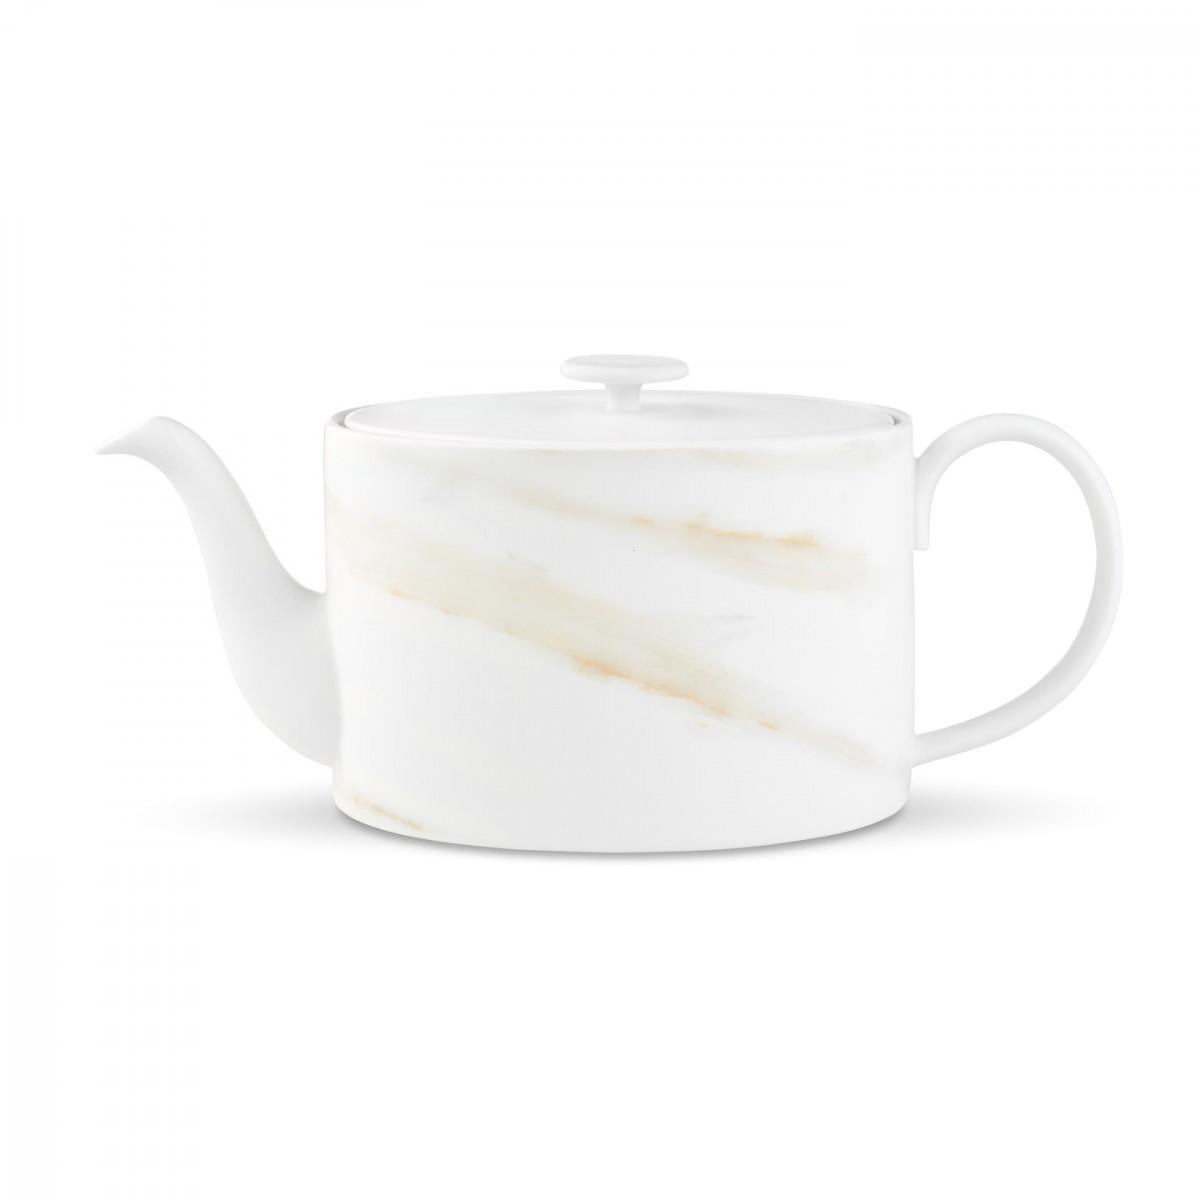 vera wang vase wedgwood of vera venato imperial teapot vera wang wedgwood us throughout vera venato imperial teapot